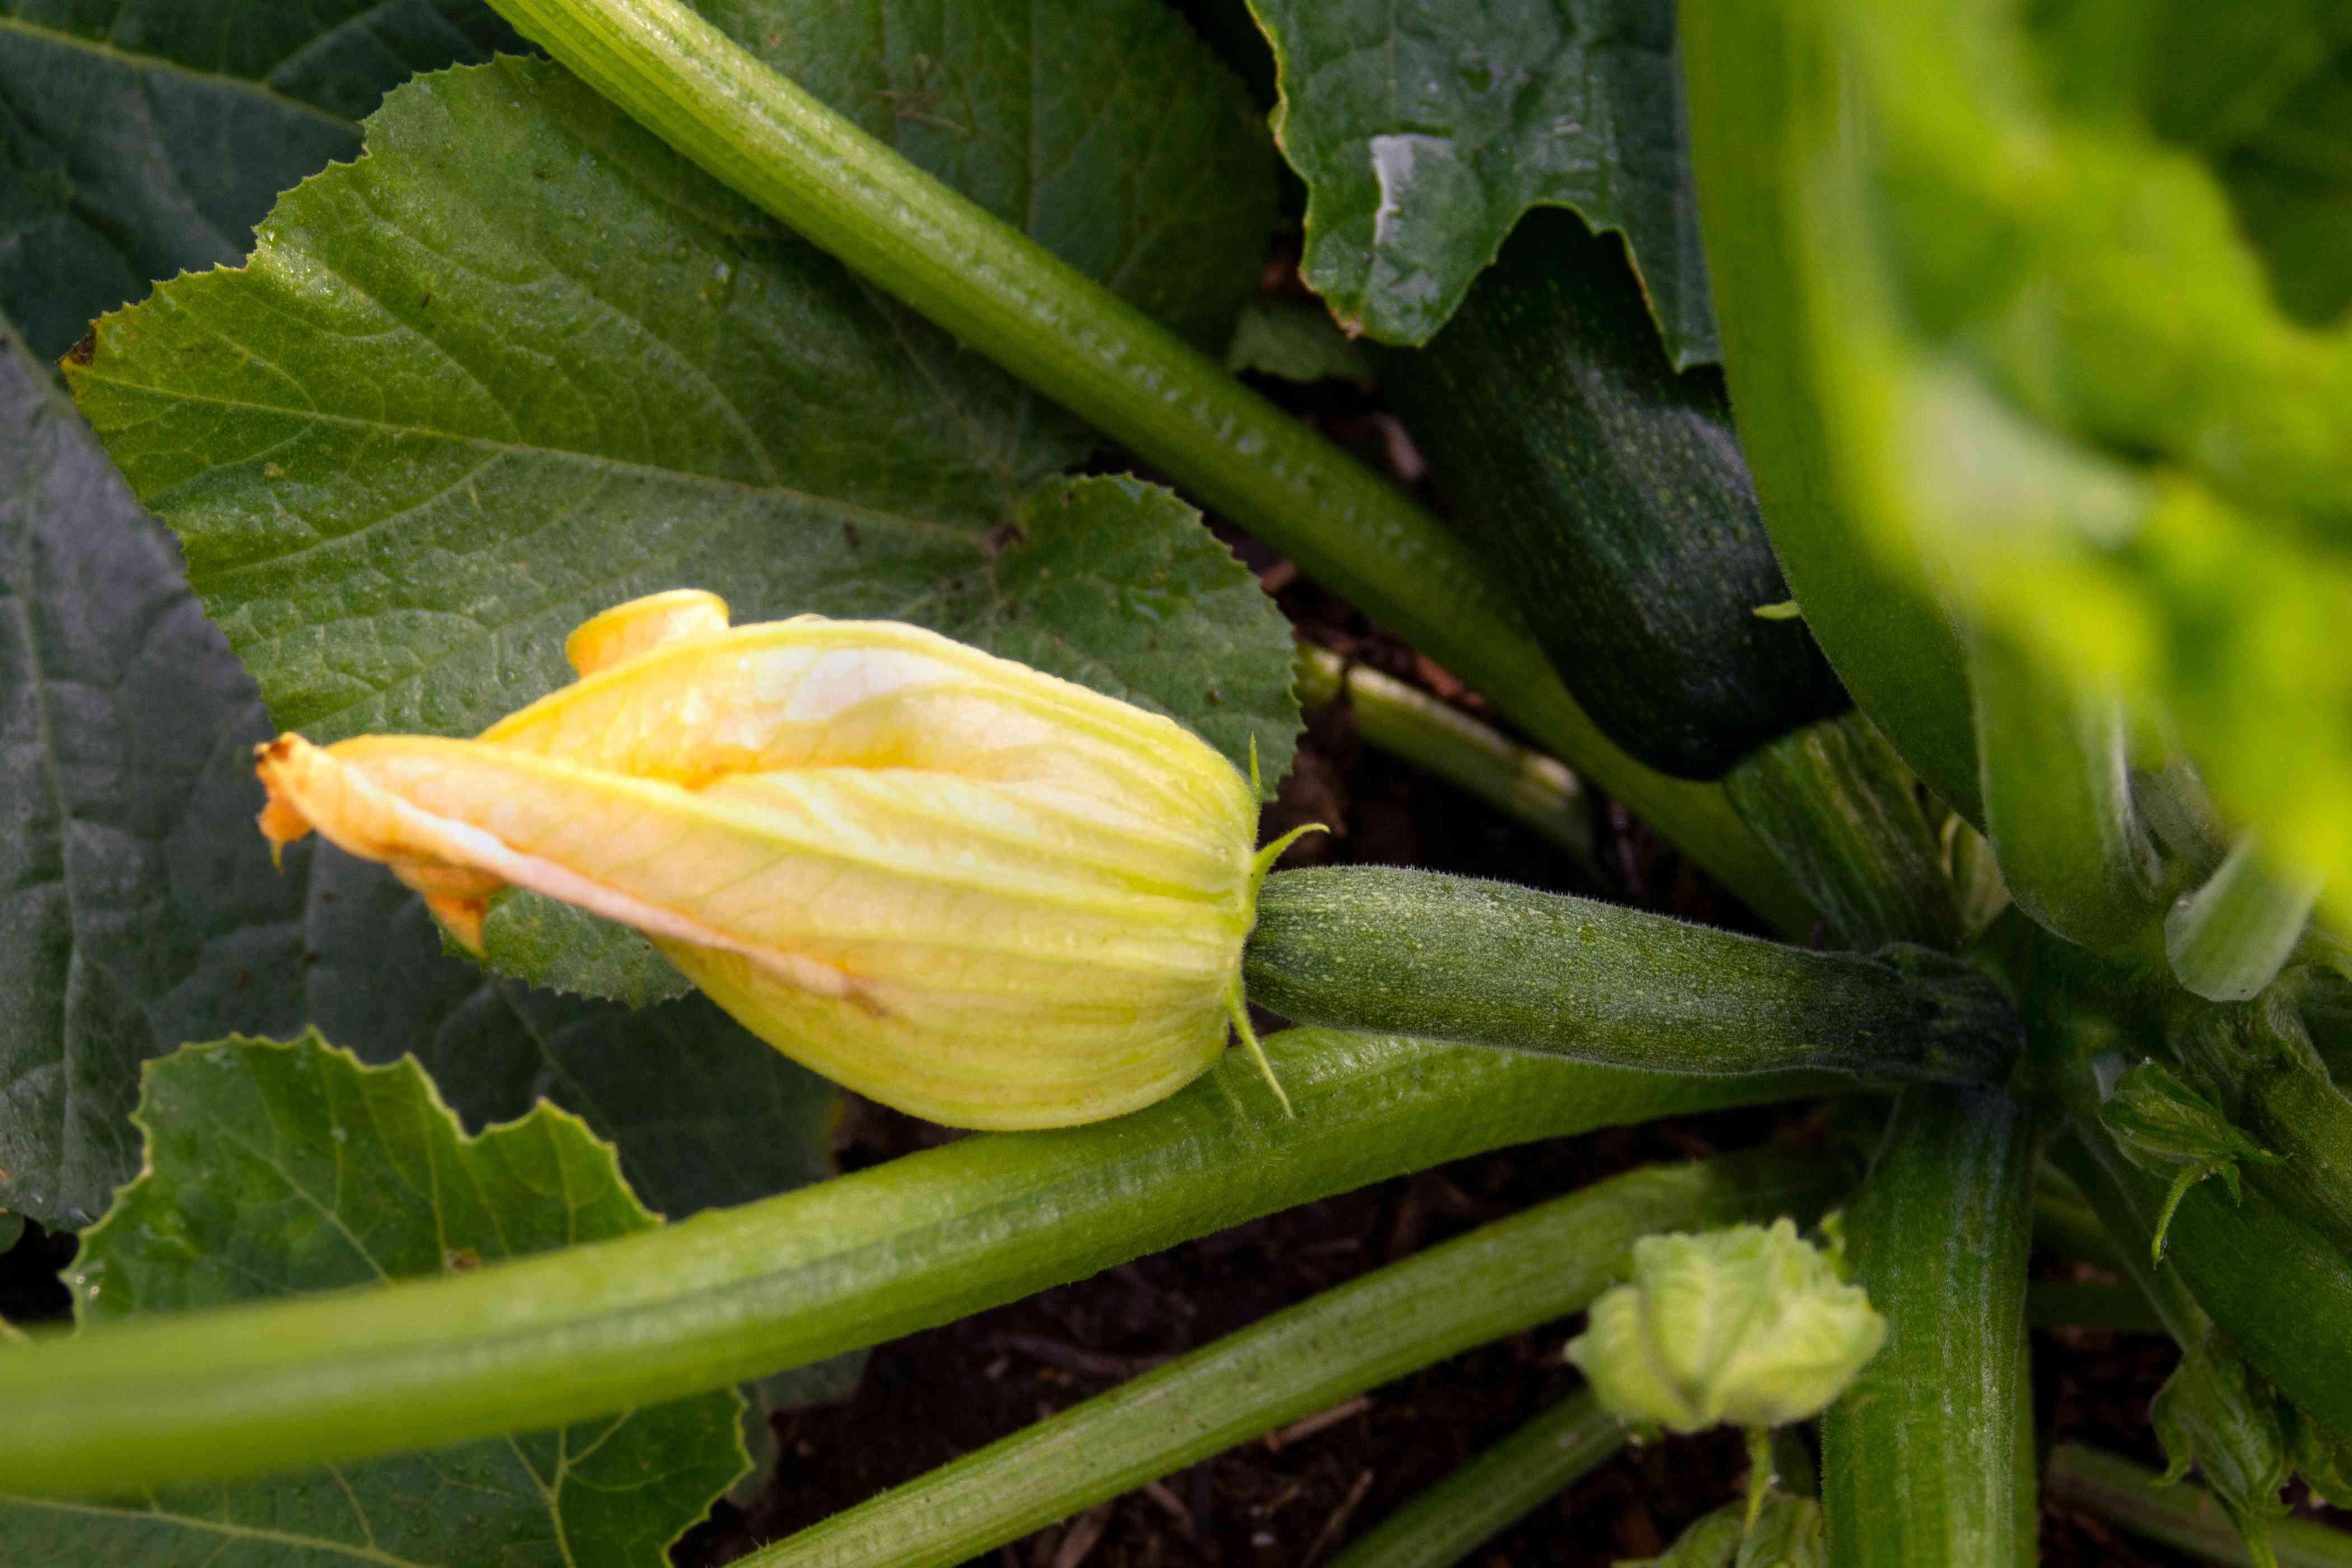 Zucchini plant stems with yellow flower bud closeup